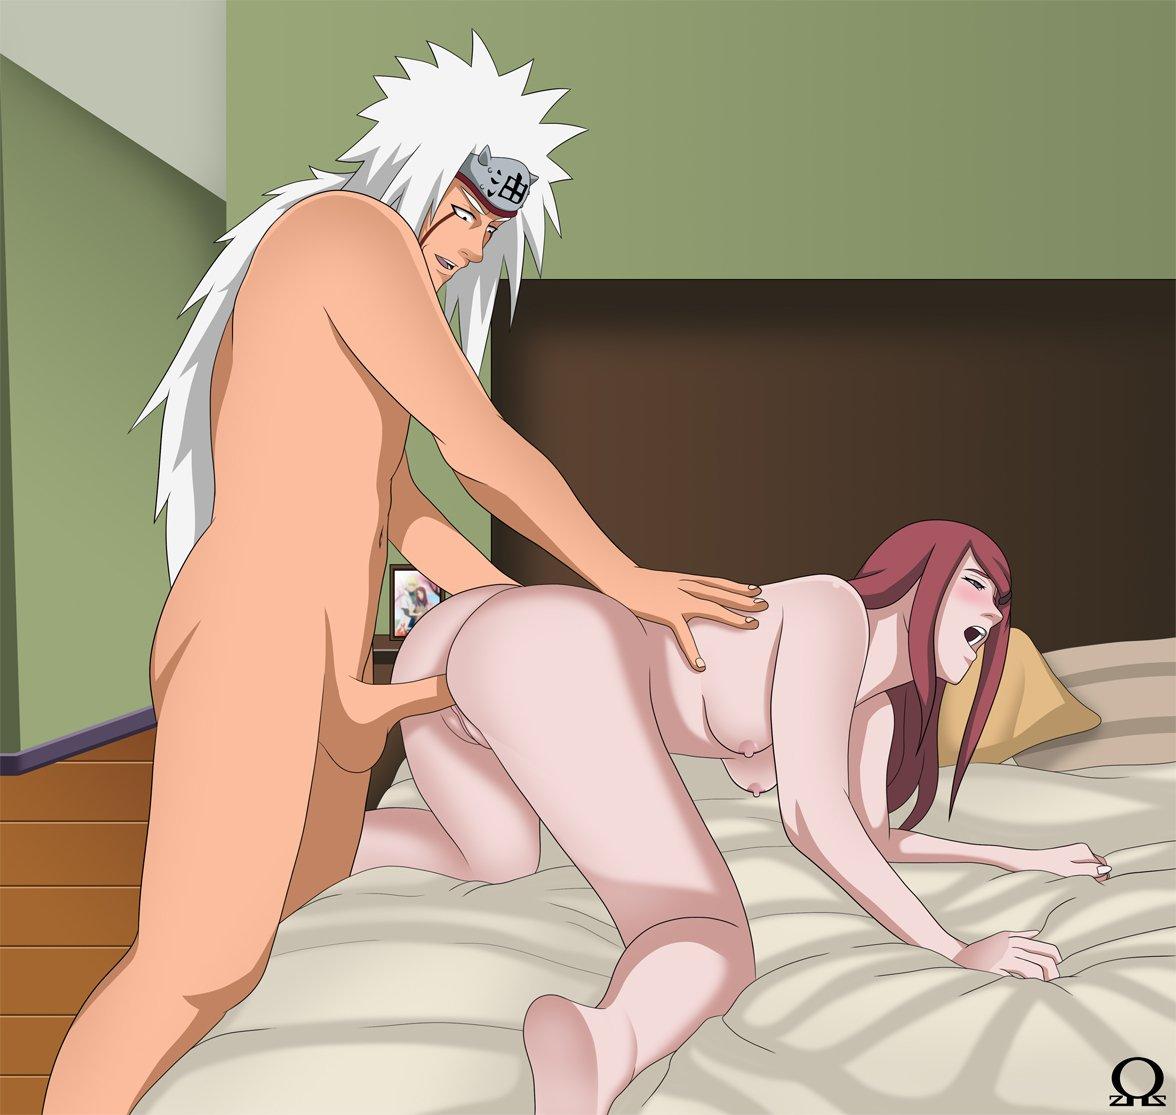 Hot naruto shipuden pornxxx, katie couric nude